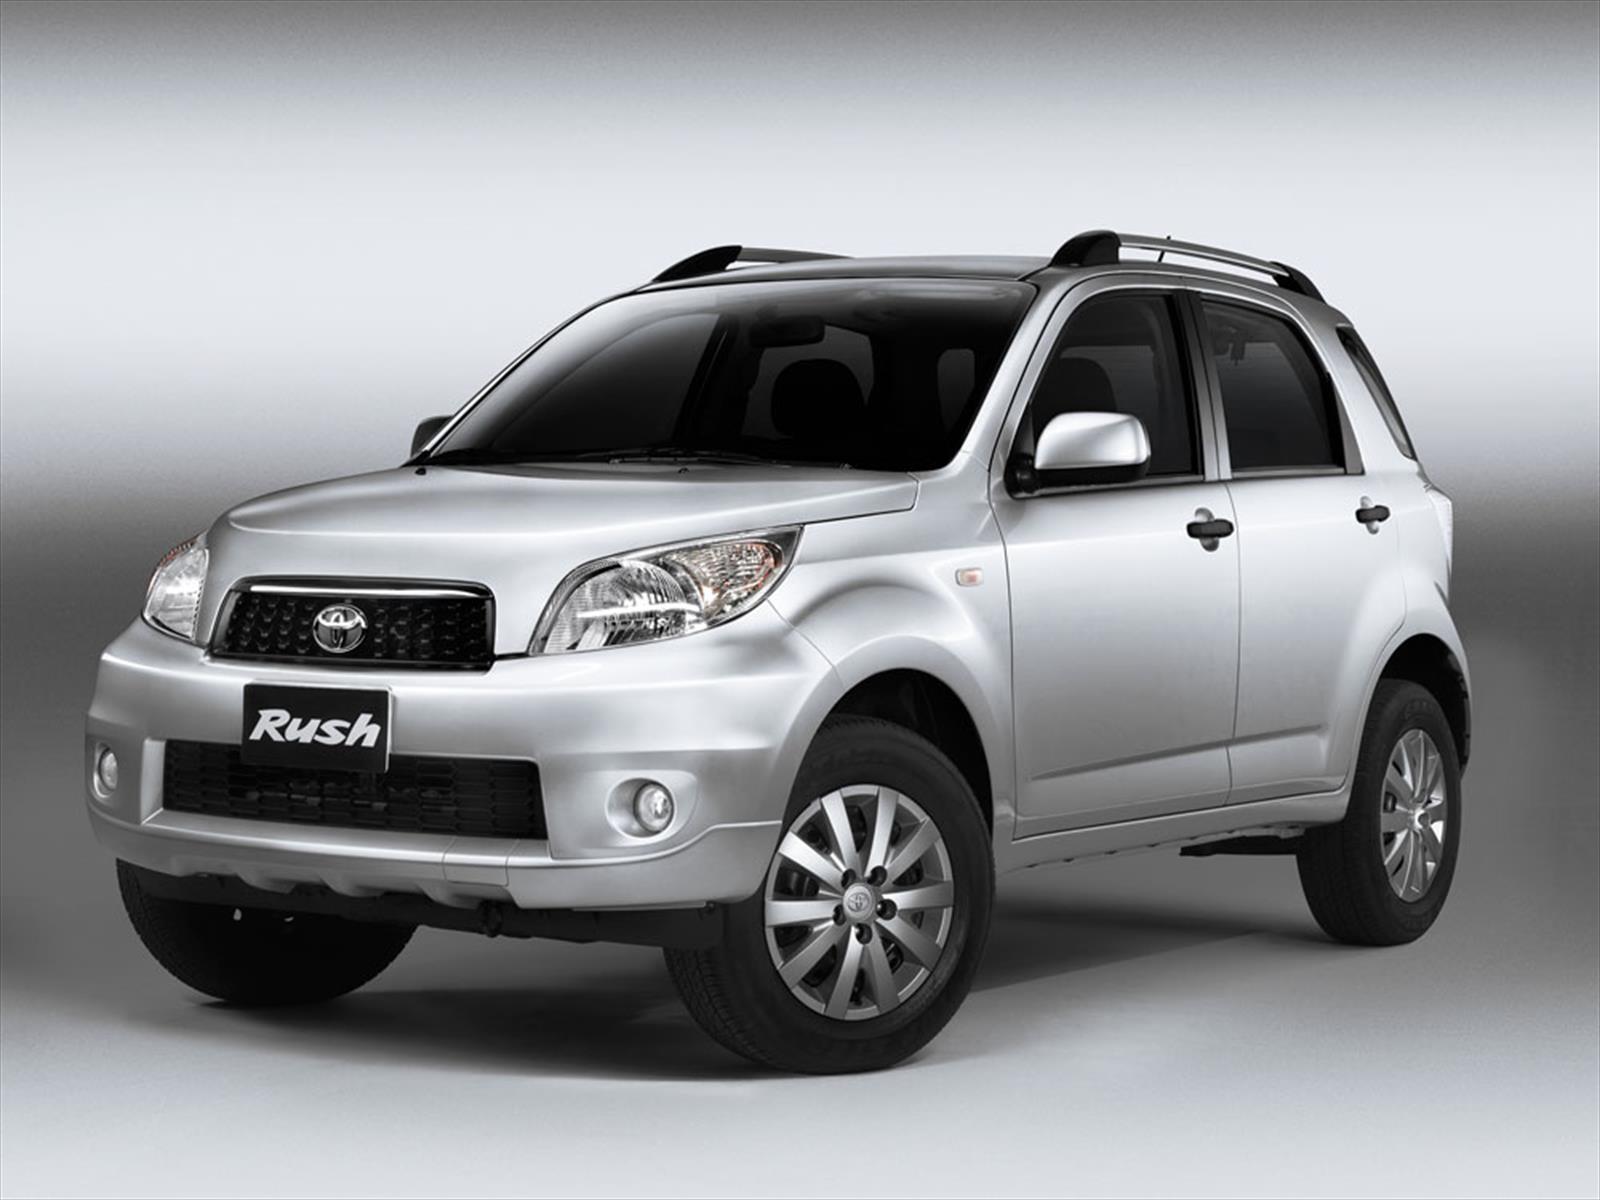 Toyota Rush 2017 se pone a la venta - Autocosmos.com